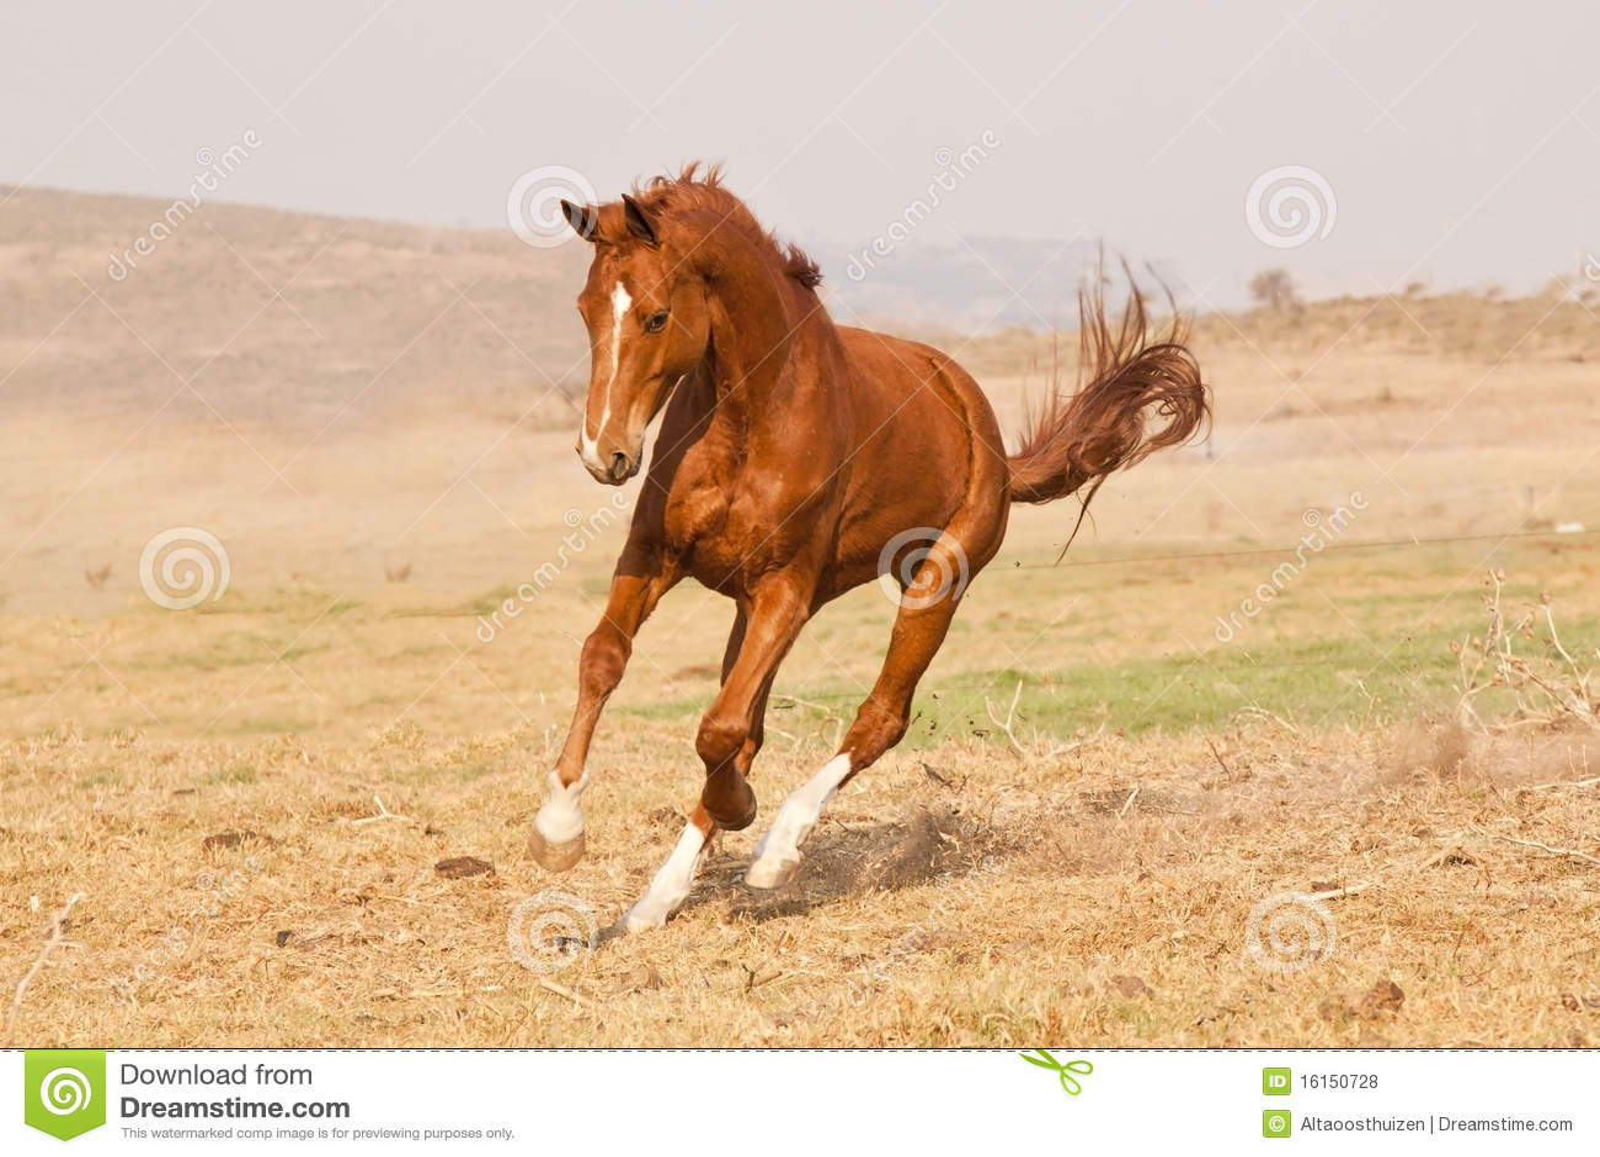 Chestnut Horse Running Stock Photo Image Of Pedigree 16150728